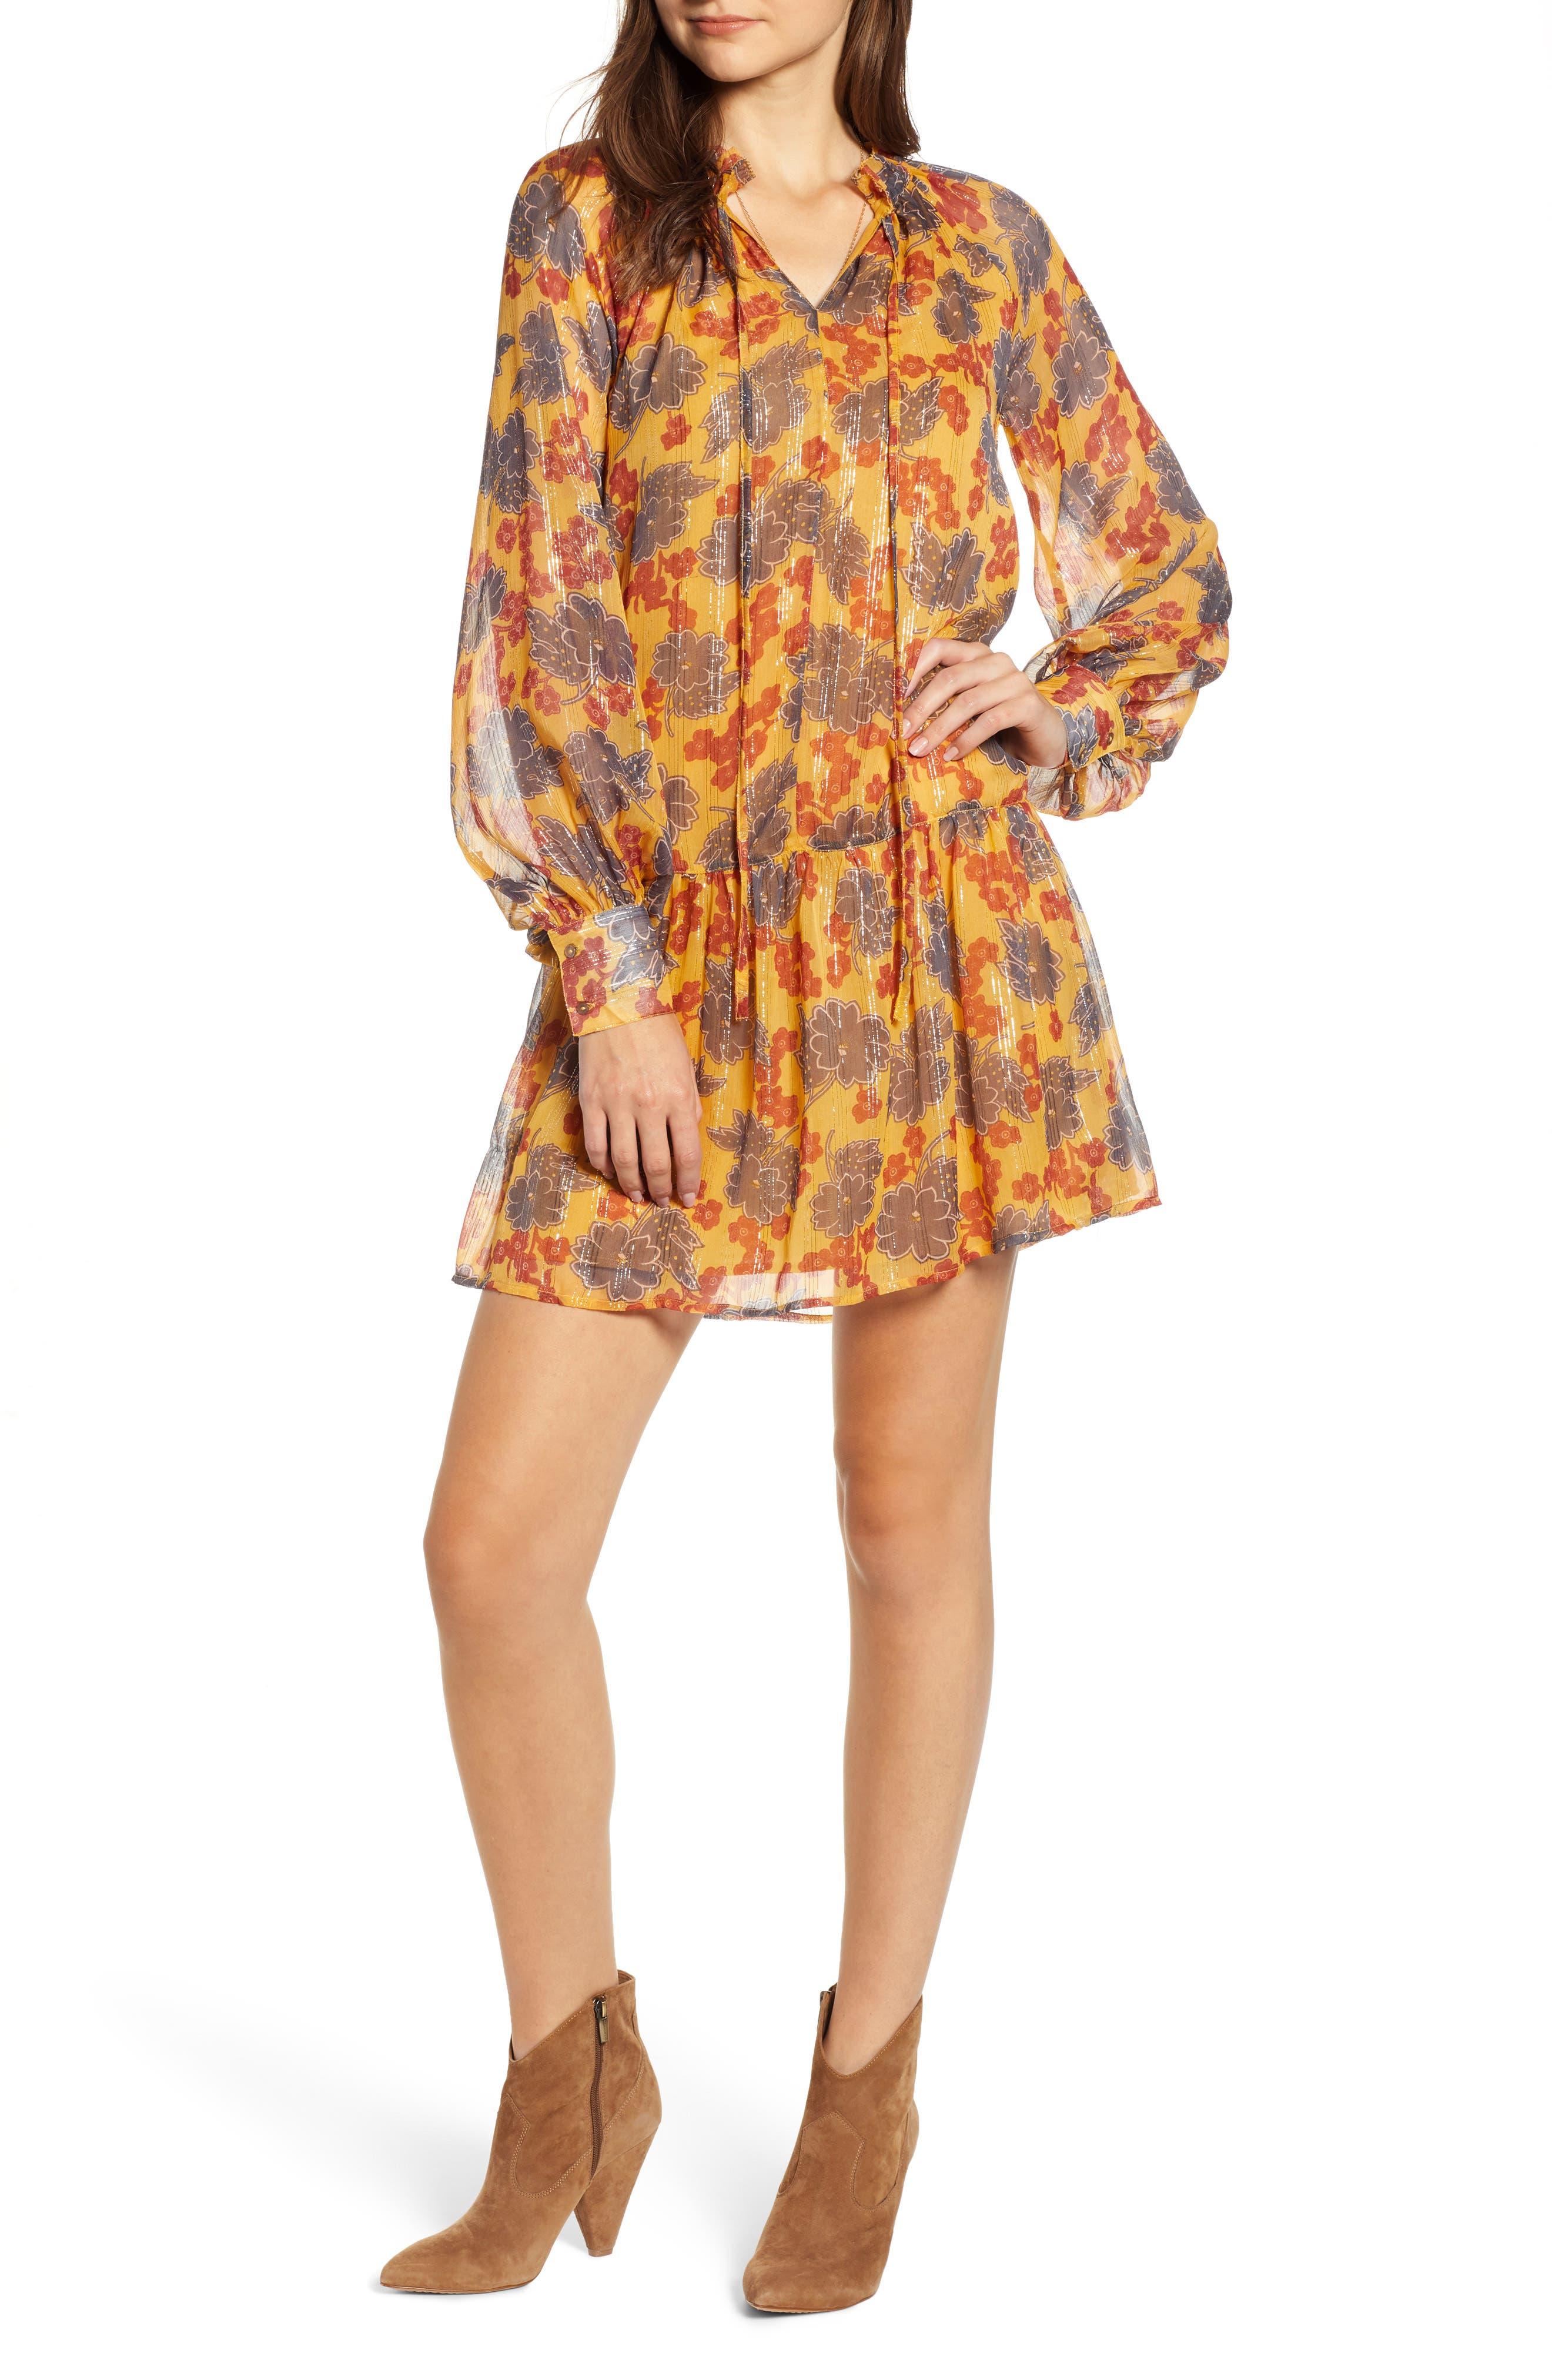 Metallic Stripe Floral Print Dress,                             Main thumbnail 1, color,                             YELLOW AND BURGUNDY